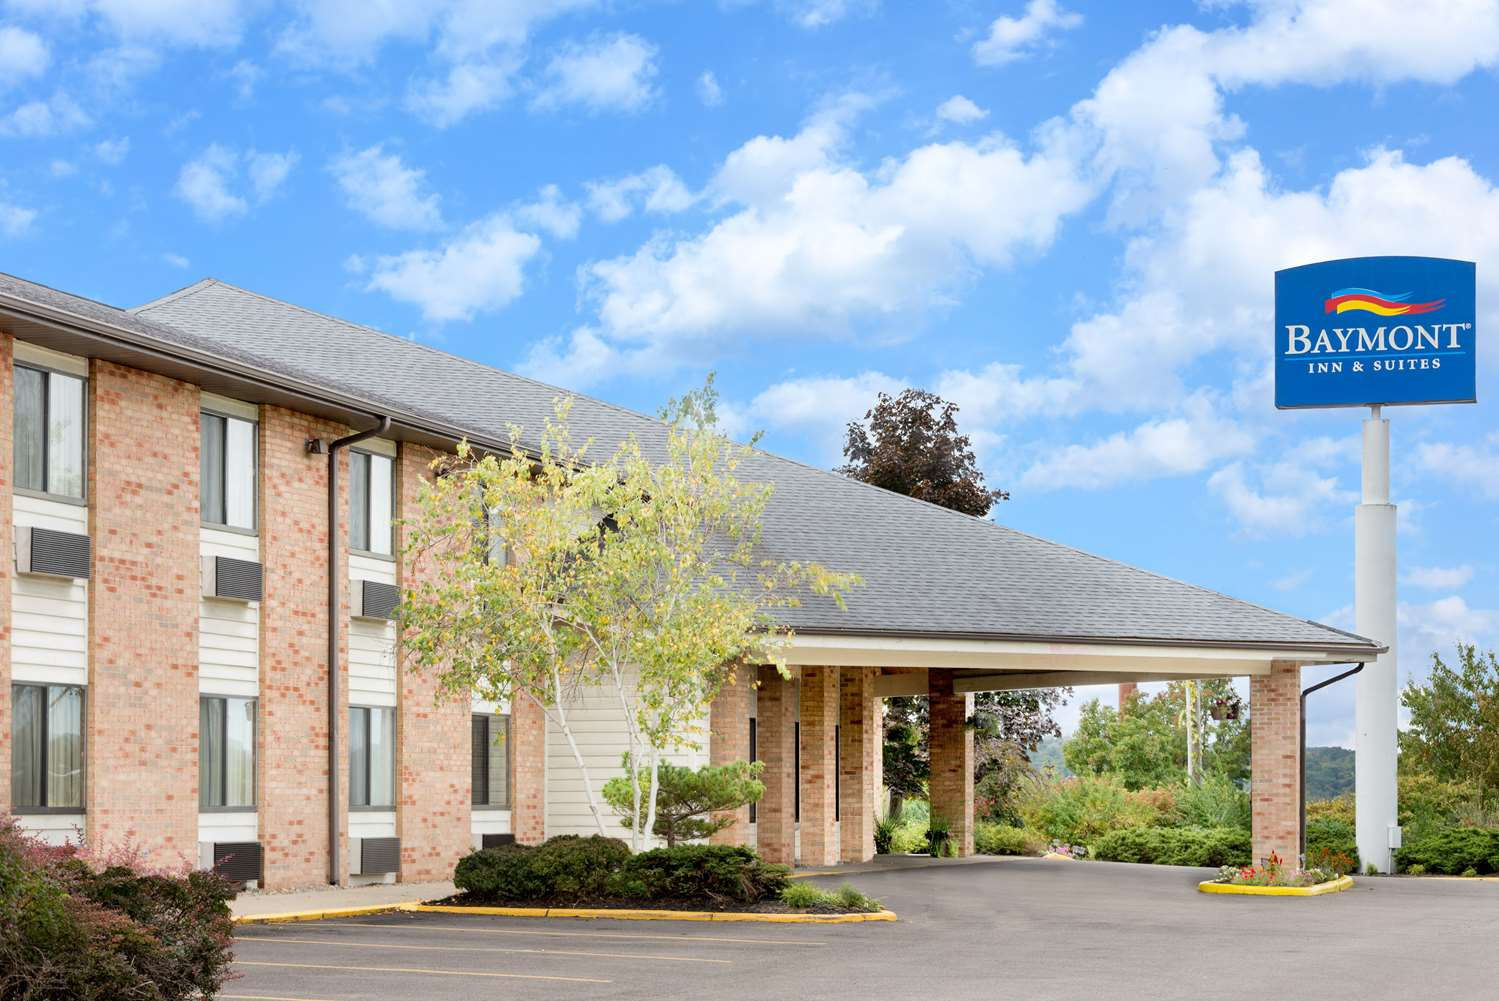 https://www.zmchamber.com/VisitZanesvilleApp/Baymont Inn Suites